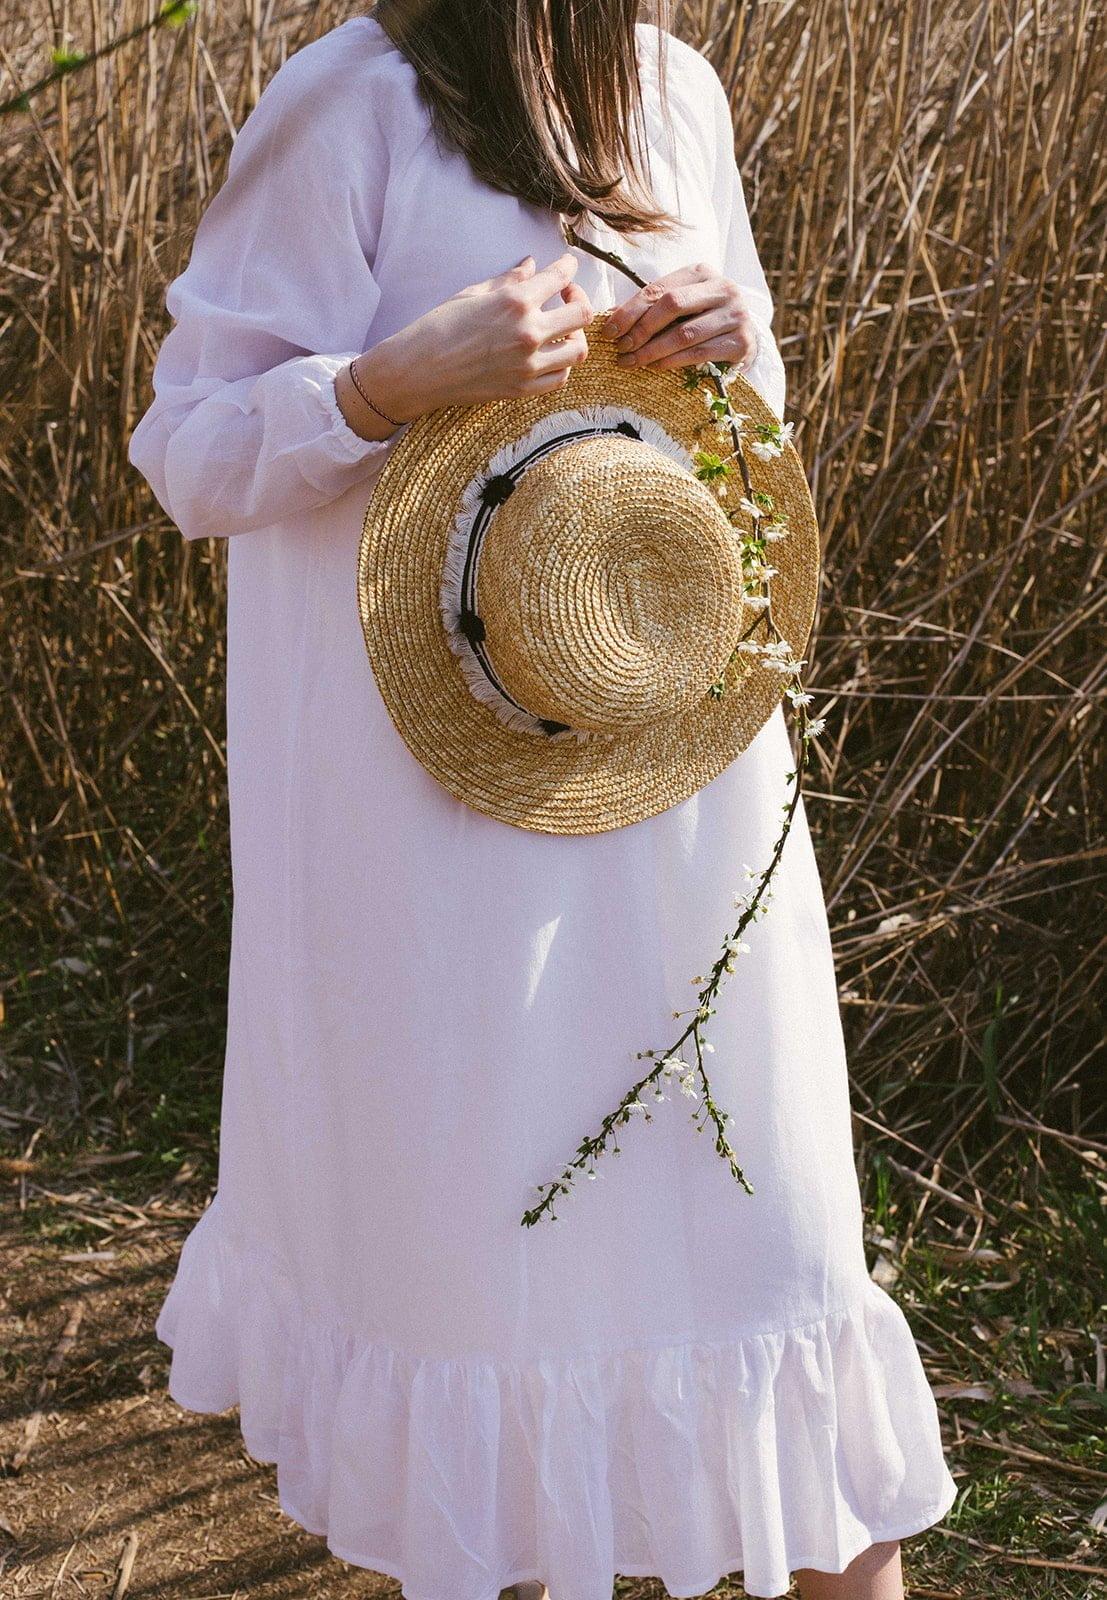 Rochie femeie alba confortabila vascoza panza topita